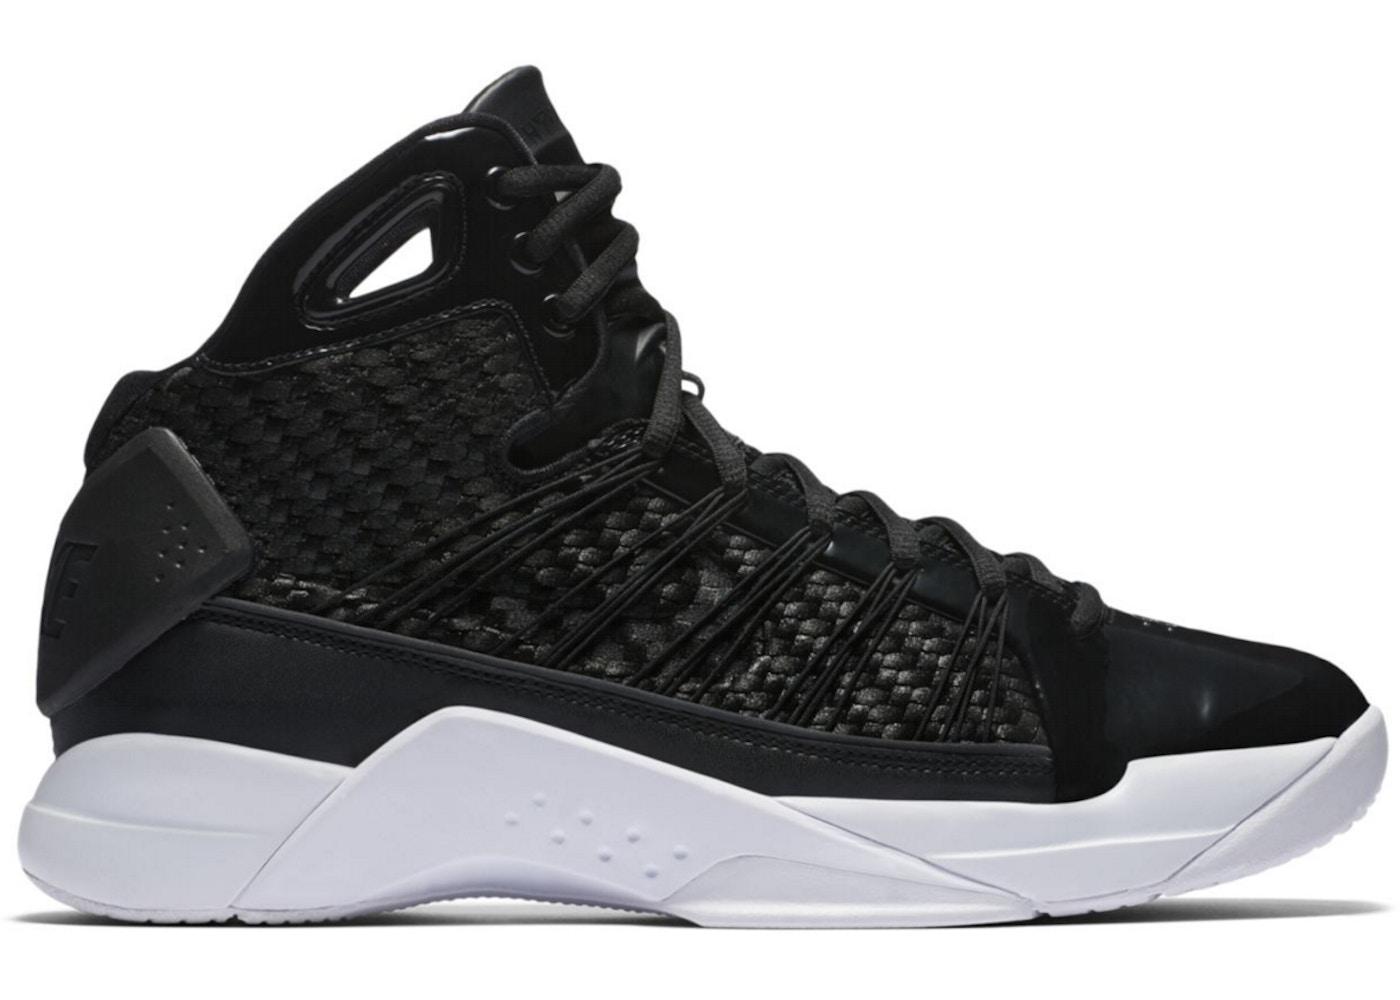 purchase cheap 4341b 9f030 Buy Nike Basketball Hyperdunk Shoes   Deadstock Sneakers